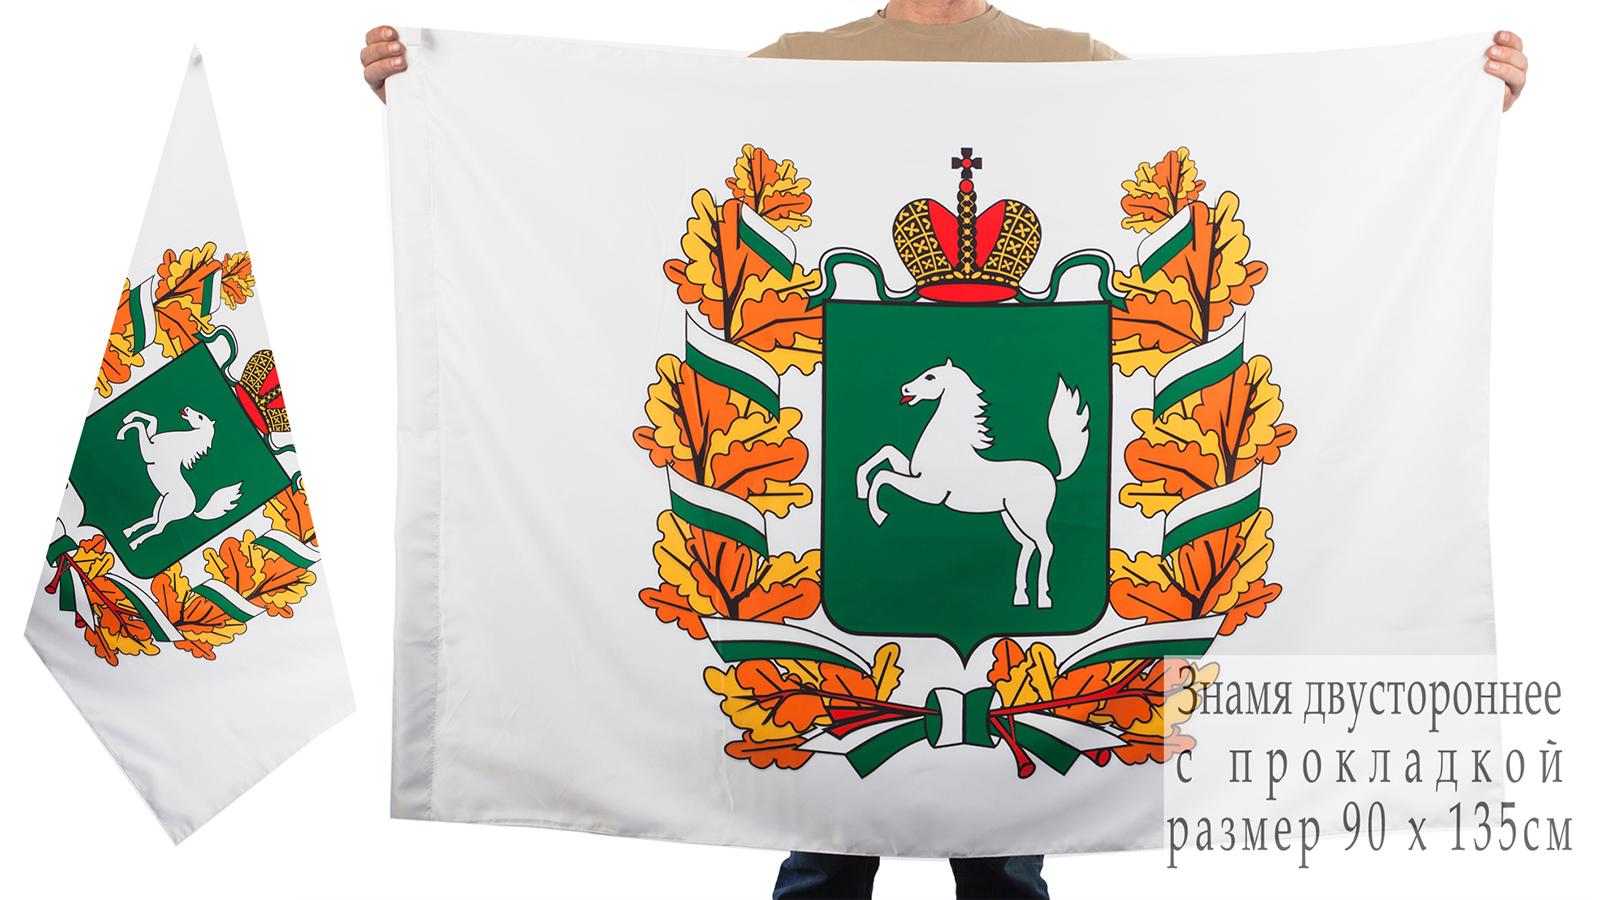 Двухсторонний флаг Томской области